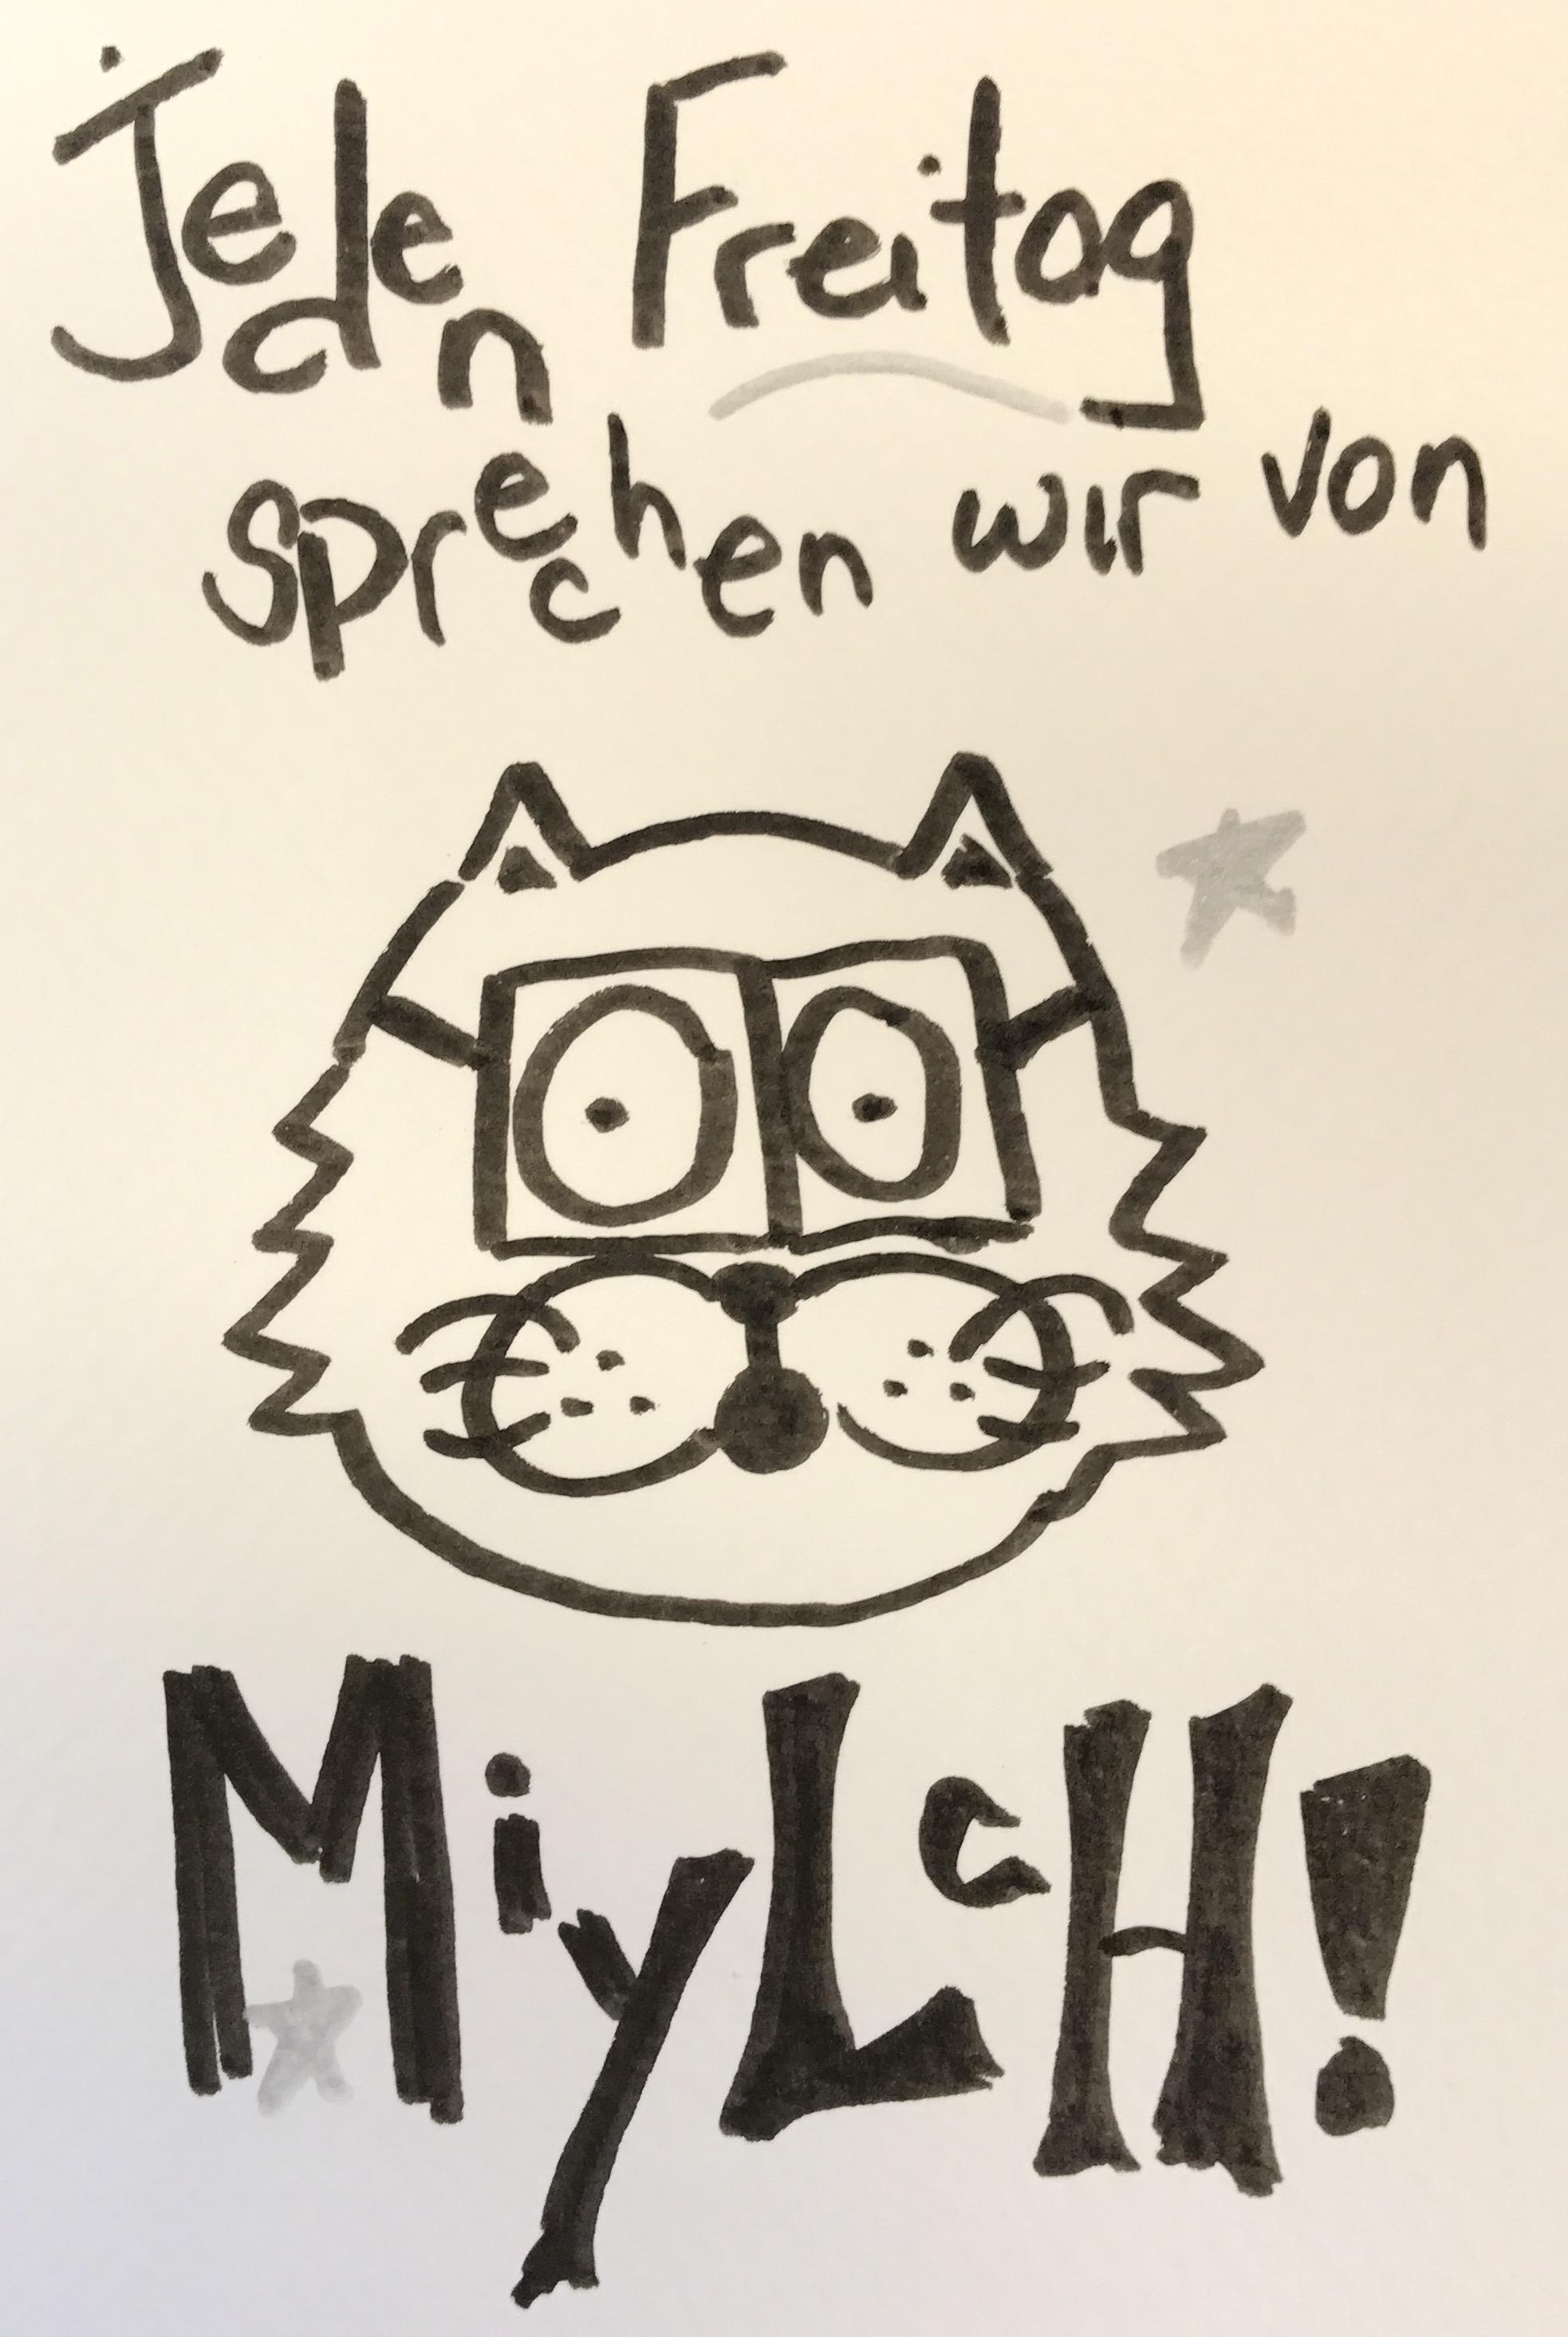 Jeden Freitag sprechen wir von MIYLCH 日本語 日本 描く かわいい コミックス ペン art drawing comic manga cartoon ink ka